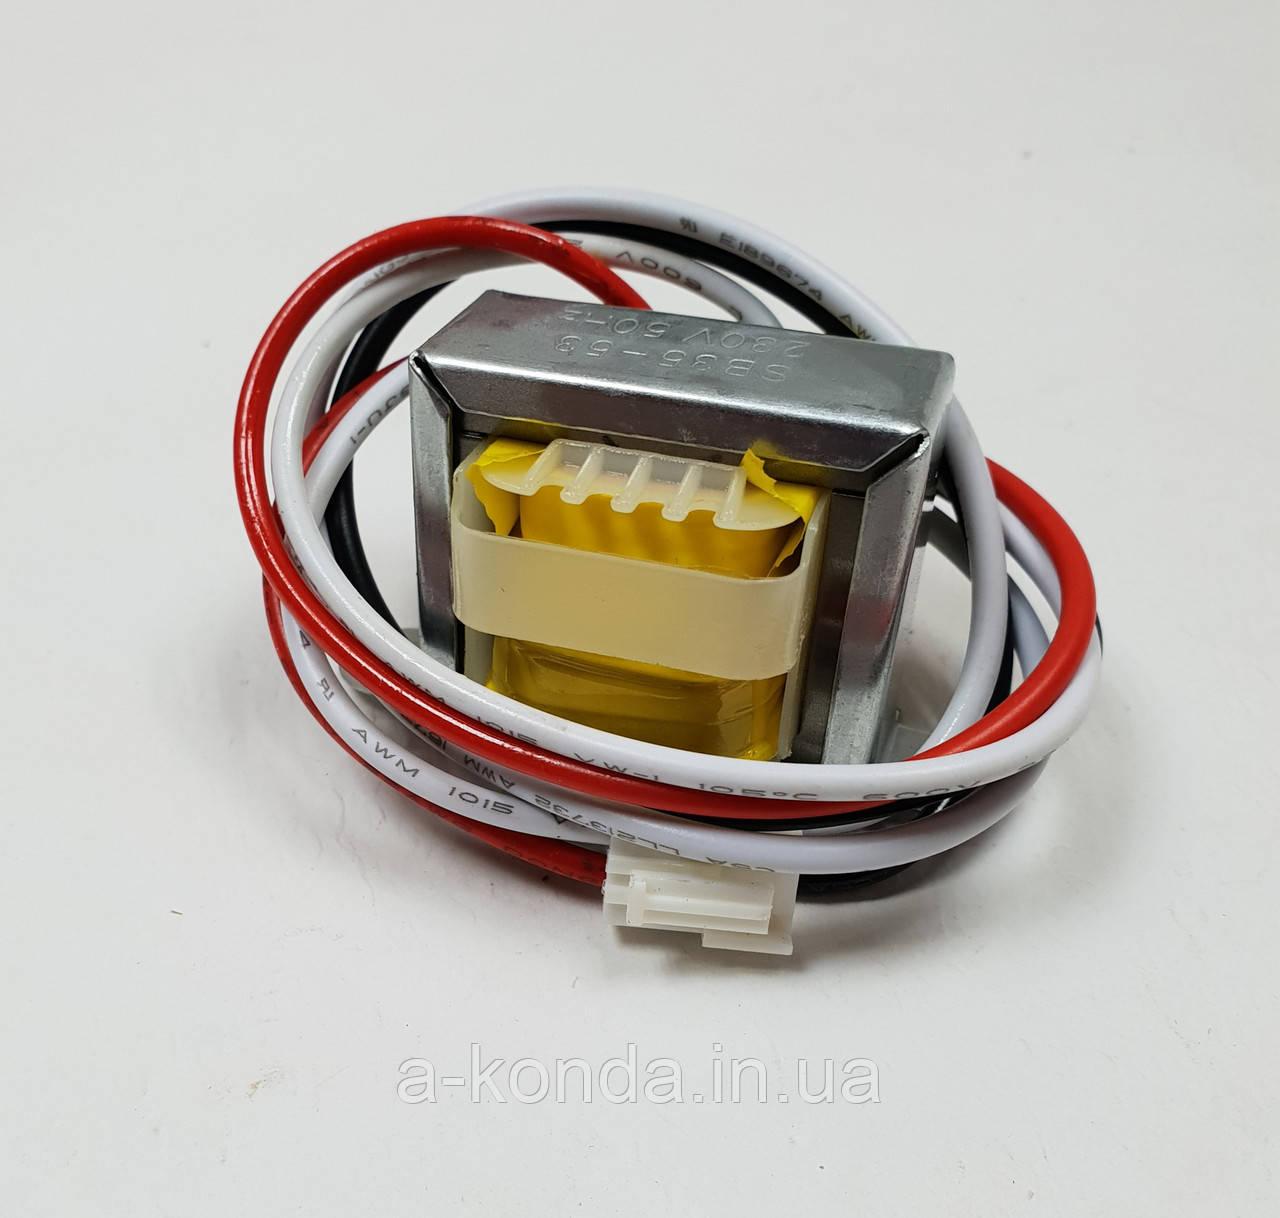 Трансформатор для хлебопечки Zelmer 43Z011